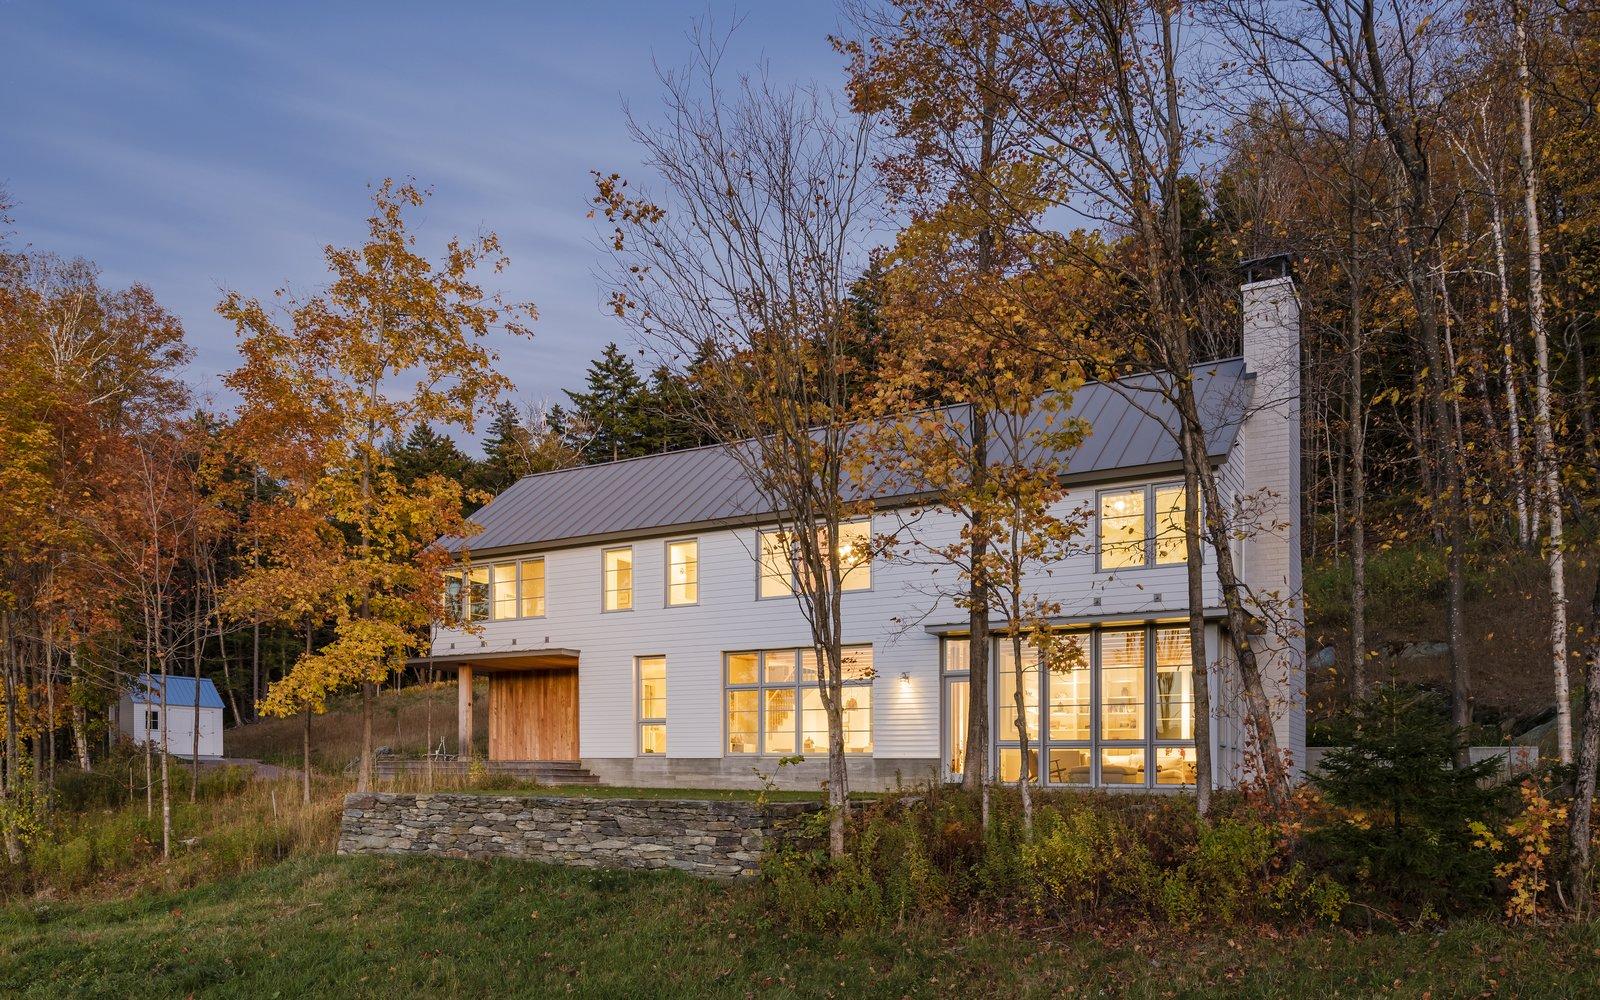 20 Modern Farmhouse Design Ideas That Are Irresistibly Chic